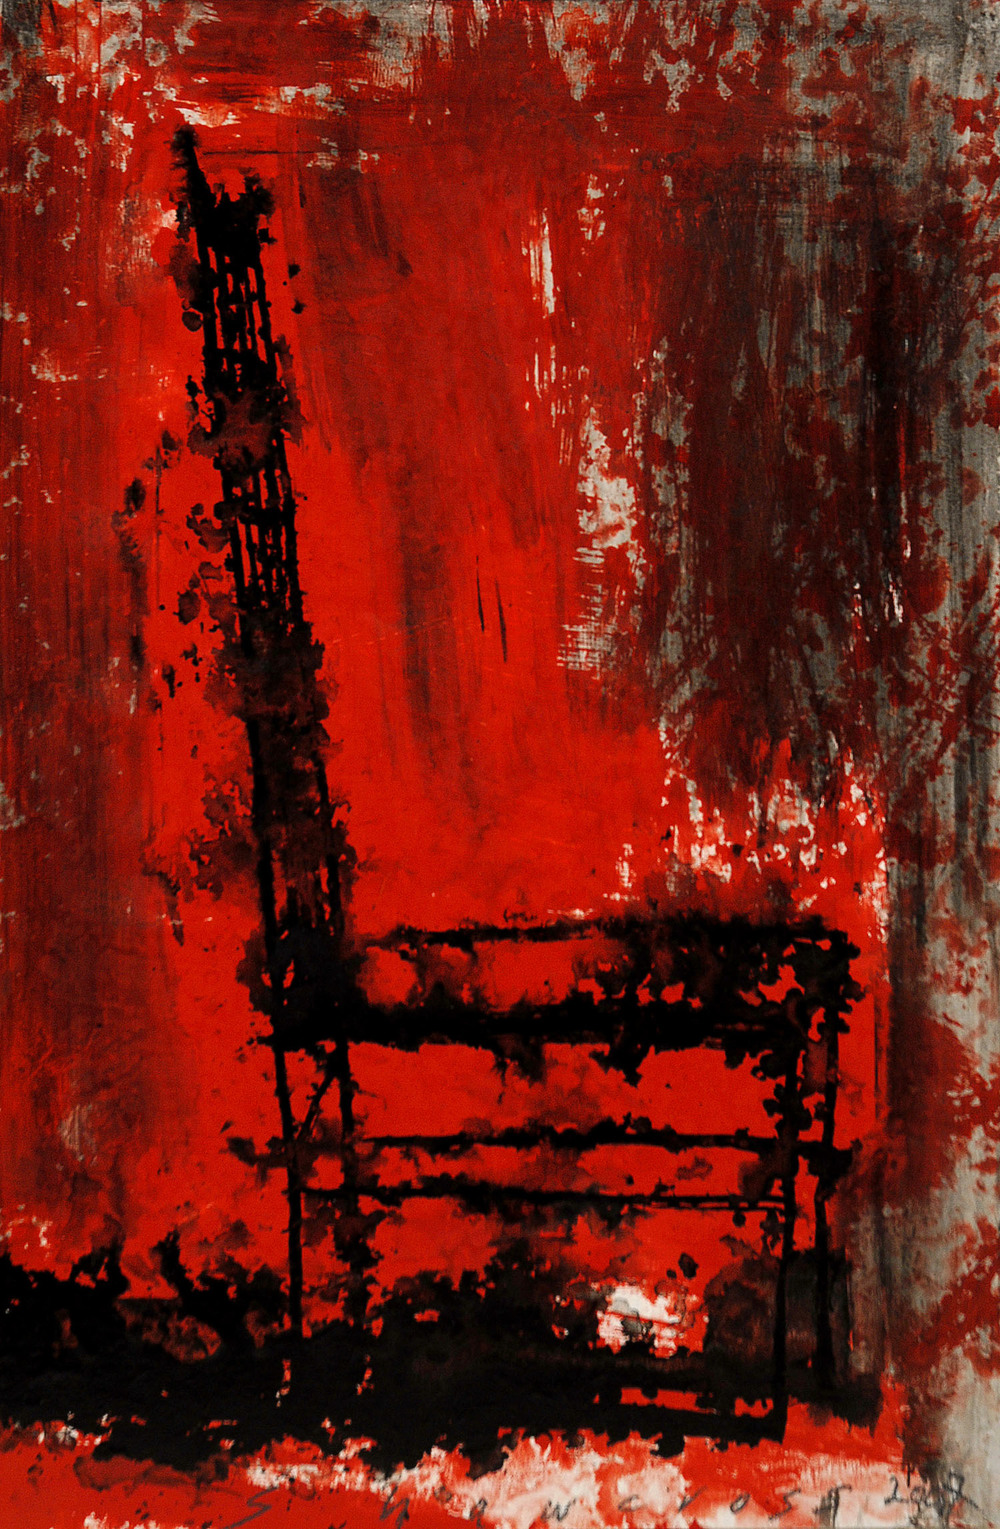 Neil Shawcross_-_#8_acrylic on board_30.5 x 20cm.jpg